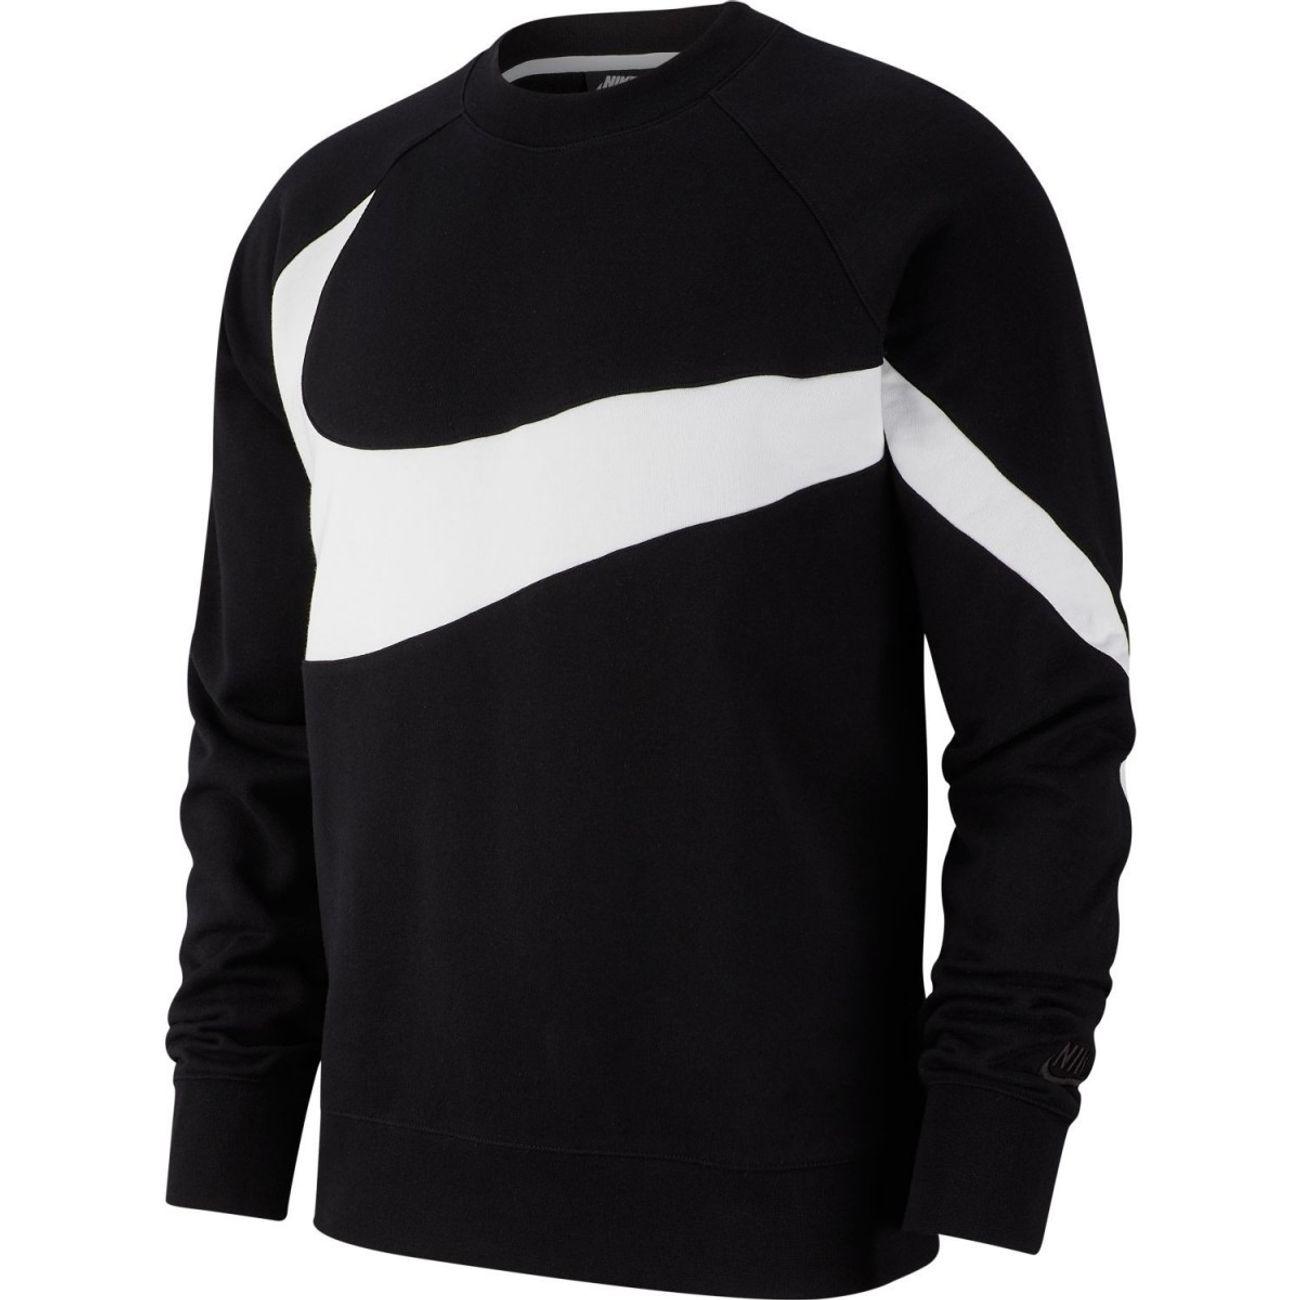 Prix Nike 012 – Achat Swoosh Ar3088 Sweatshirt Big Crew Et Pas VpqGSMzU